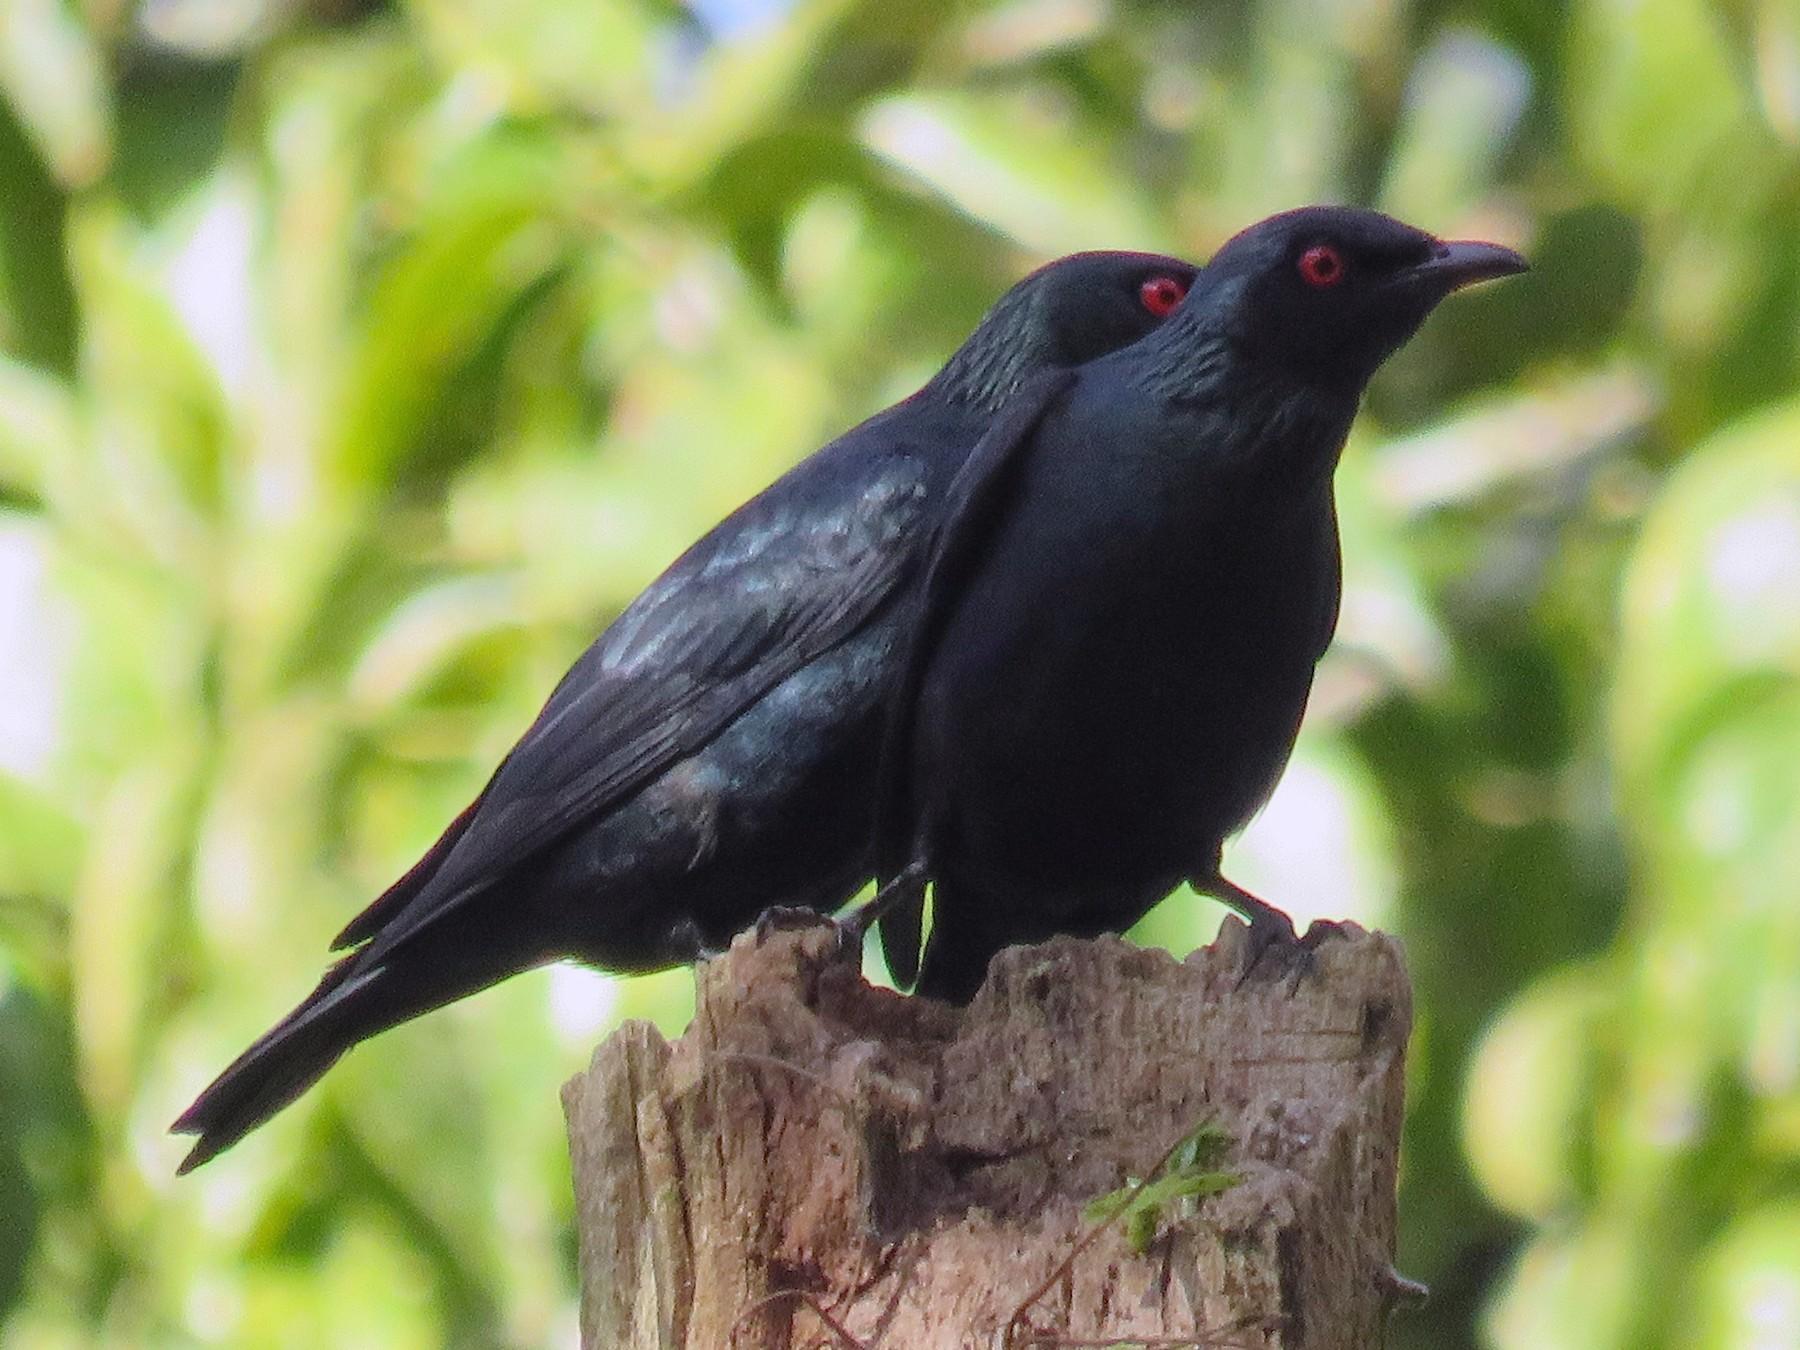 Short-tailed Starling - Dinesh Sharma